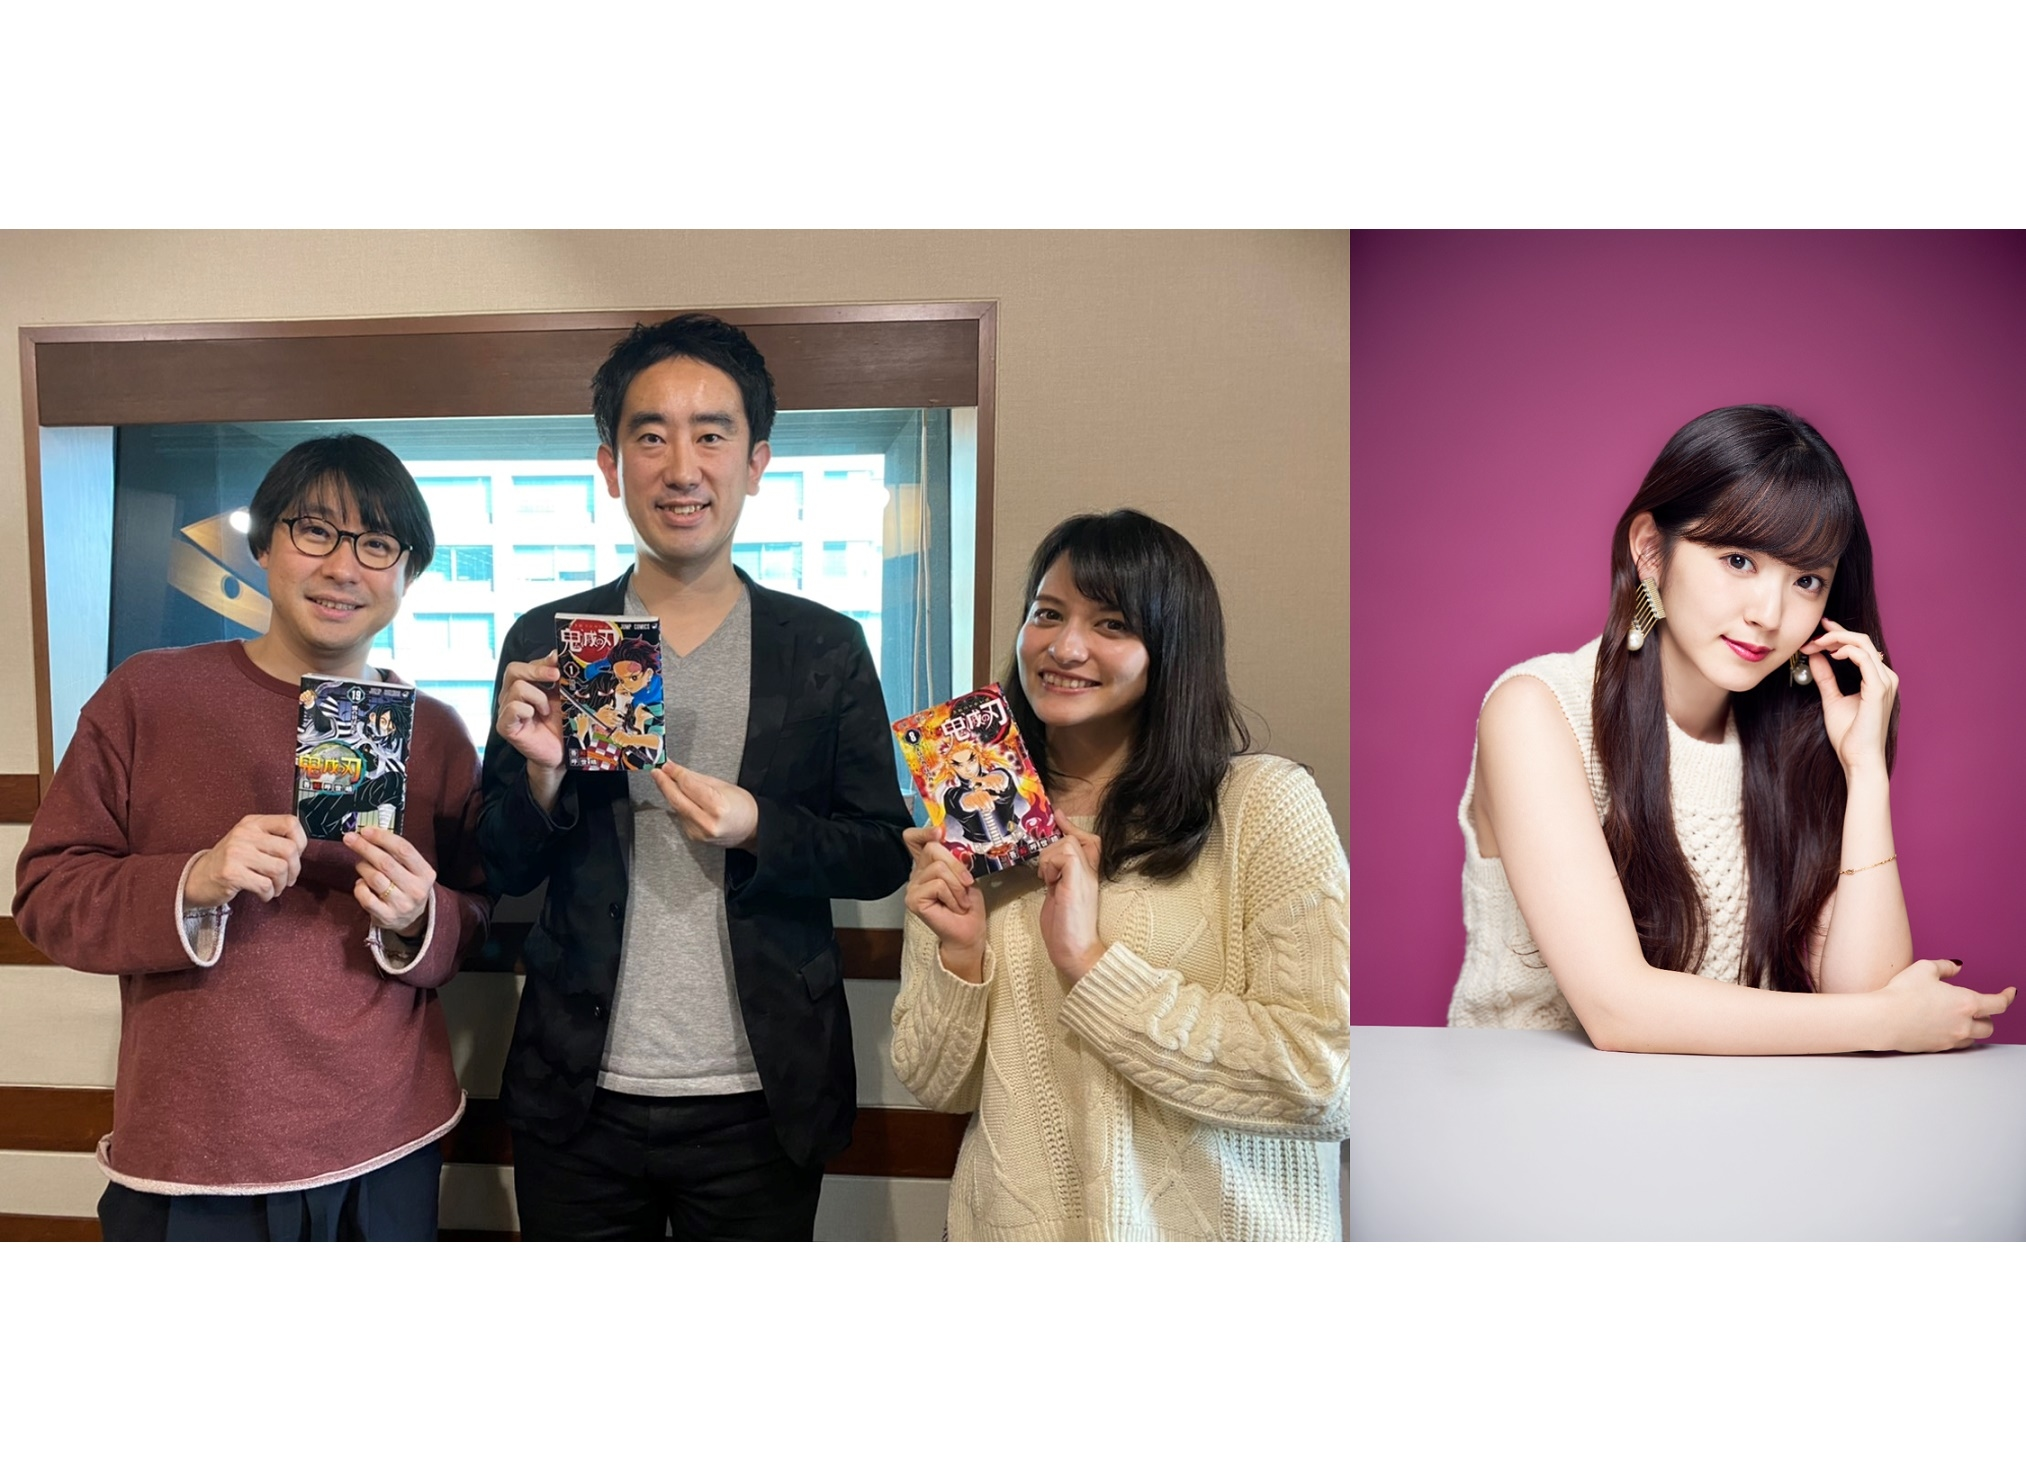 2/17~『ONE MORNING』にて鈴村健一×『鬼滅』制作P・高橋祐馬が対談